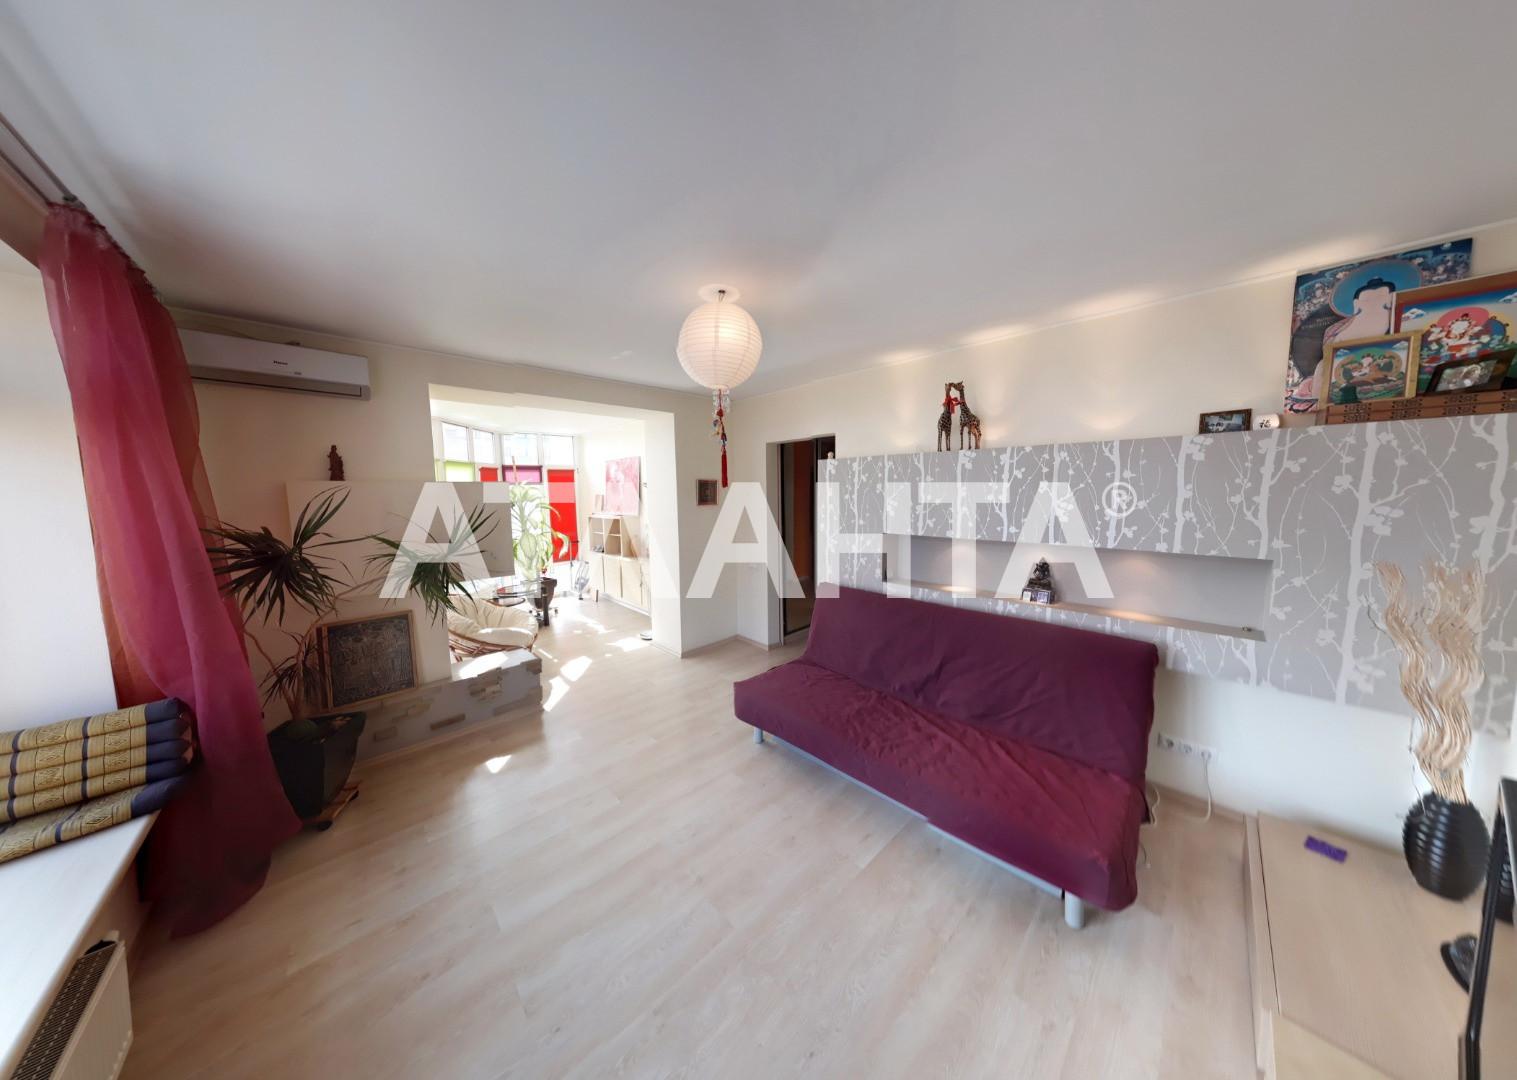 Продается 3-комнатная Квартира на ул. Ломоносова — 118 900 у.е. (фото №5)